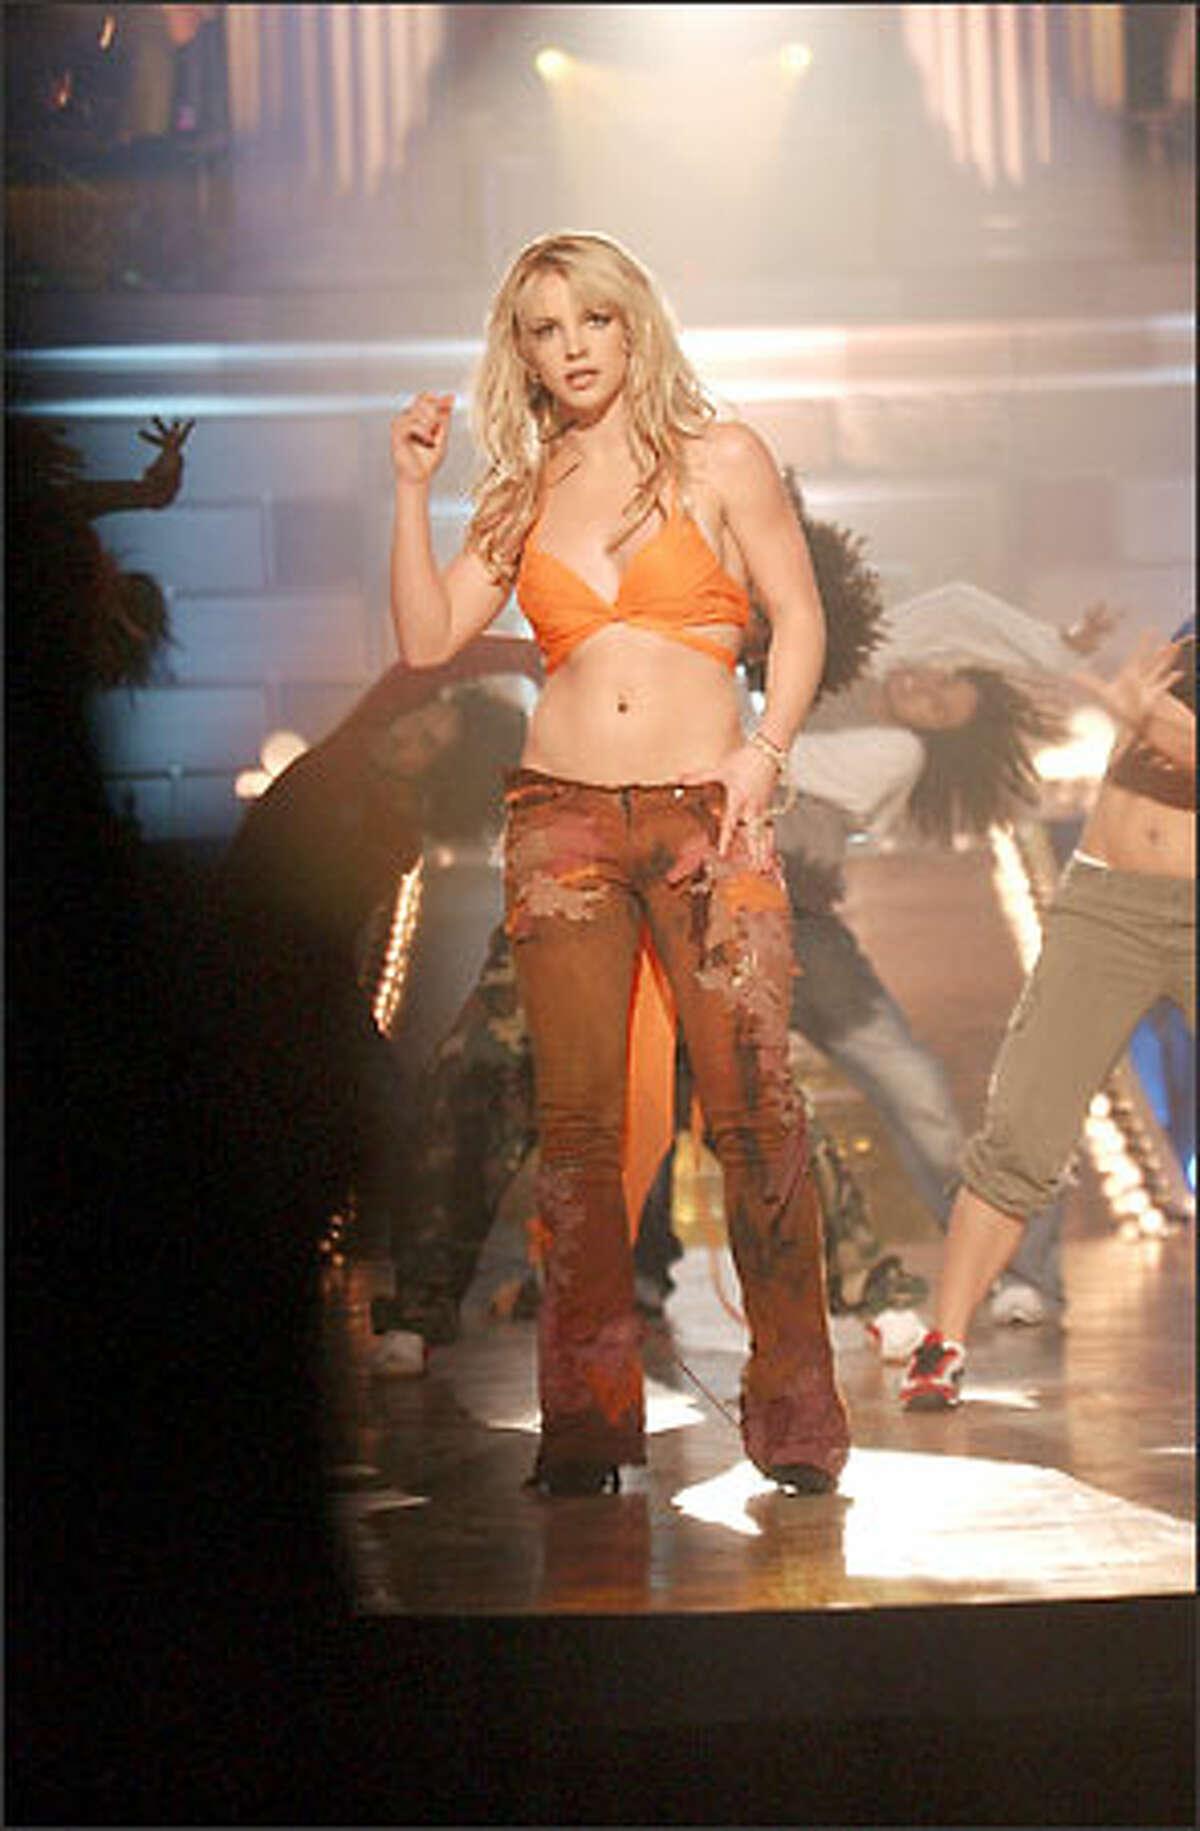 Twenty-one-year-old singing sensation Britney Spears stars in an original primetime special Monday.